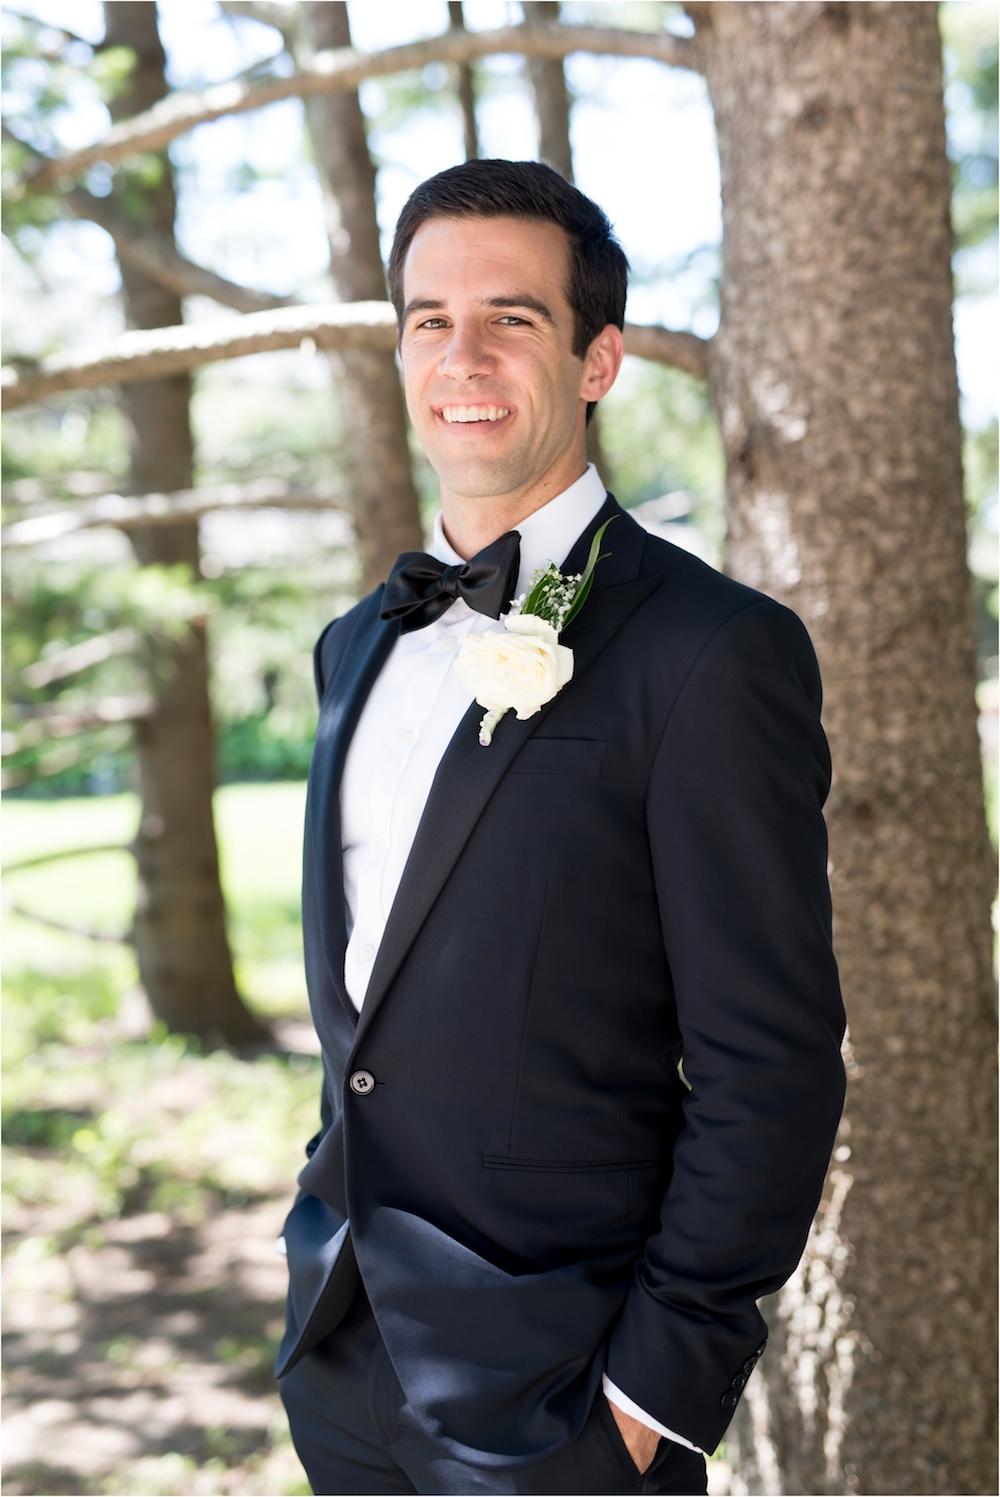 classic-planterra-detroit-michigan-wedding-photo-195.jpg